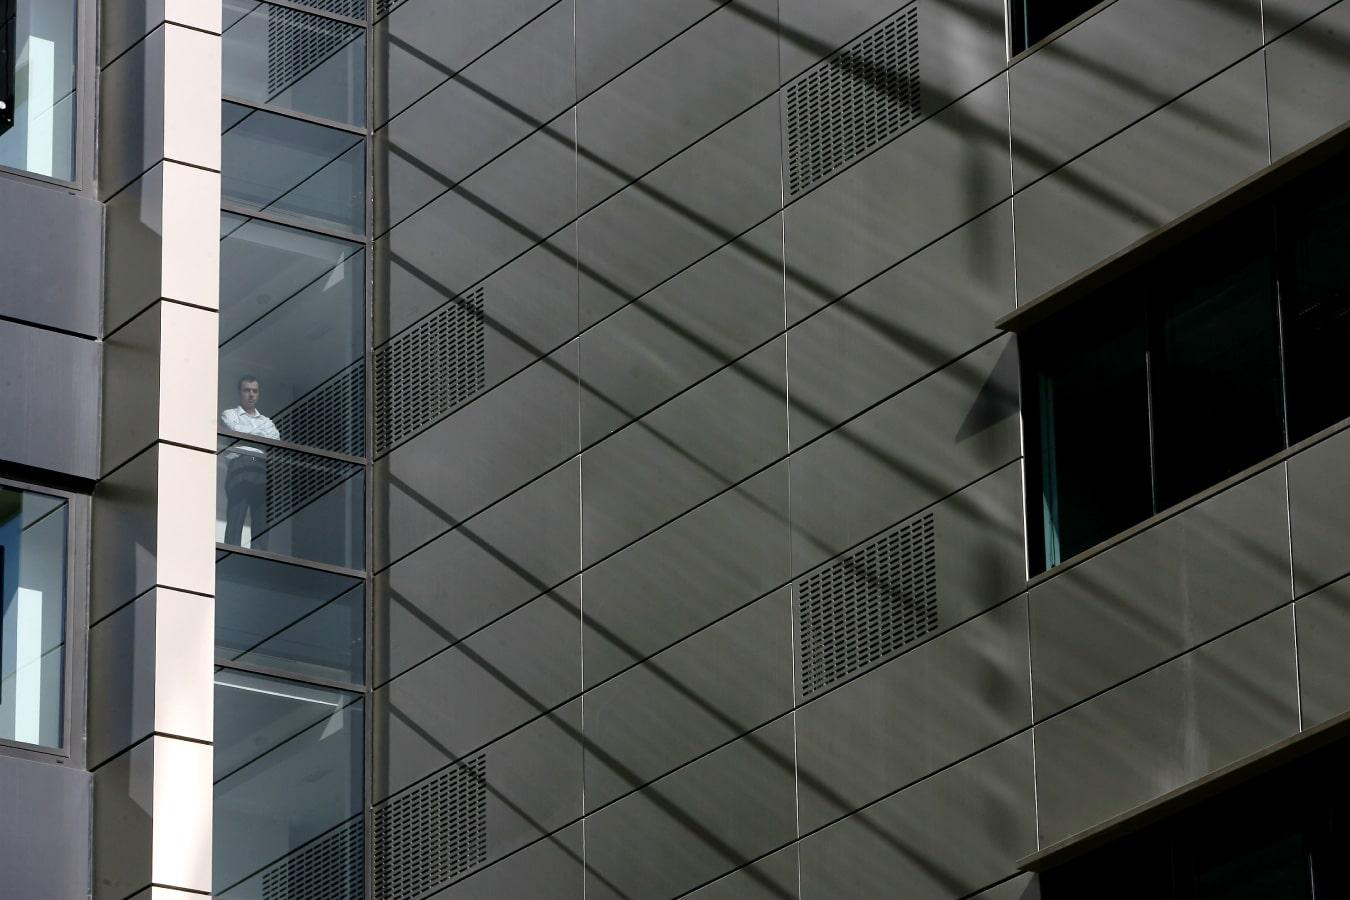 Metrovacesa sede social de renault bod arquitectura e - Arquitectura e ingenieria ...